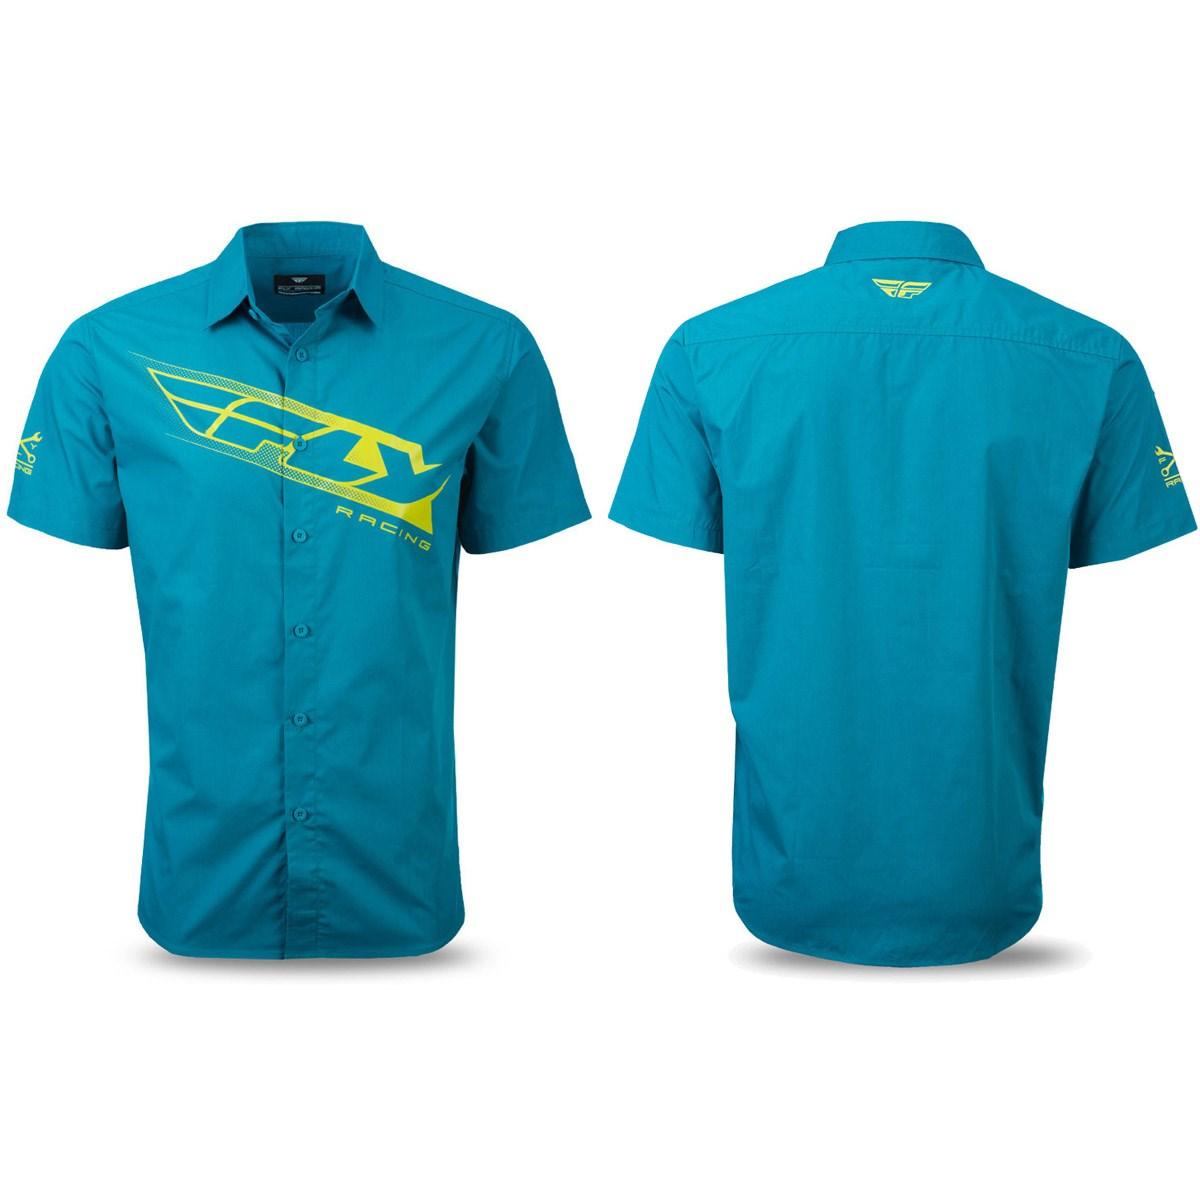 Black Fly Racing Sizes M to XL Pit Crew Mechanic Shirt